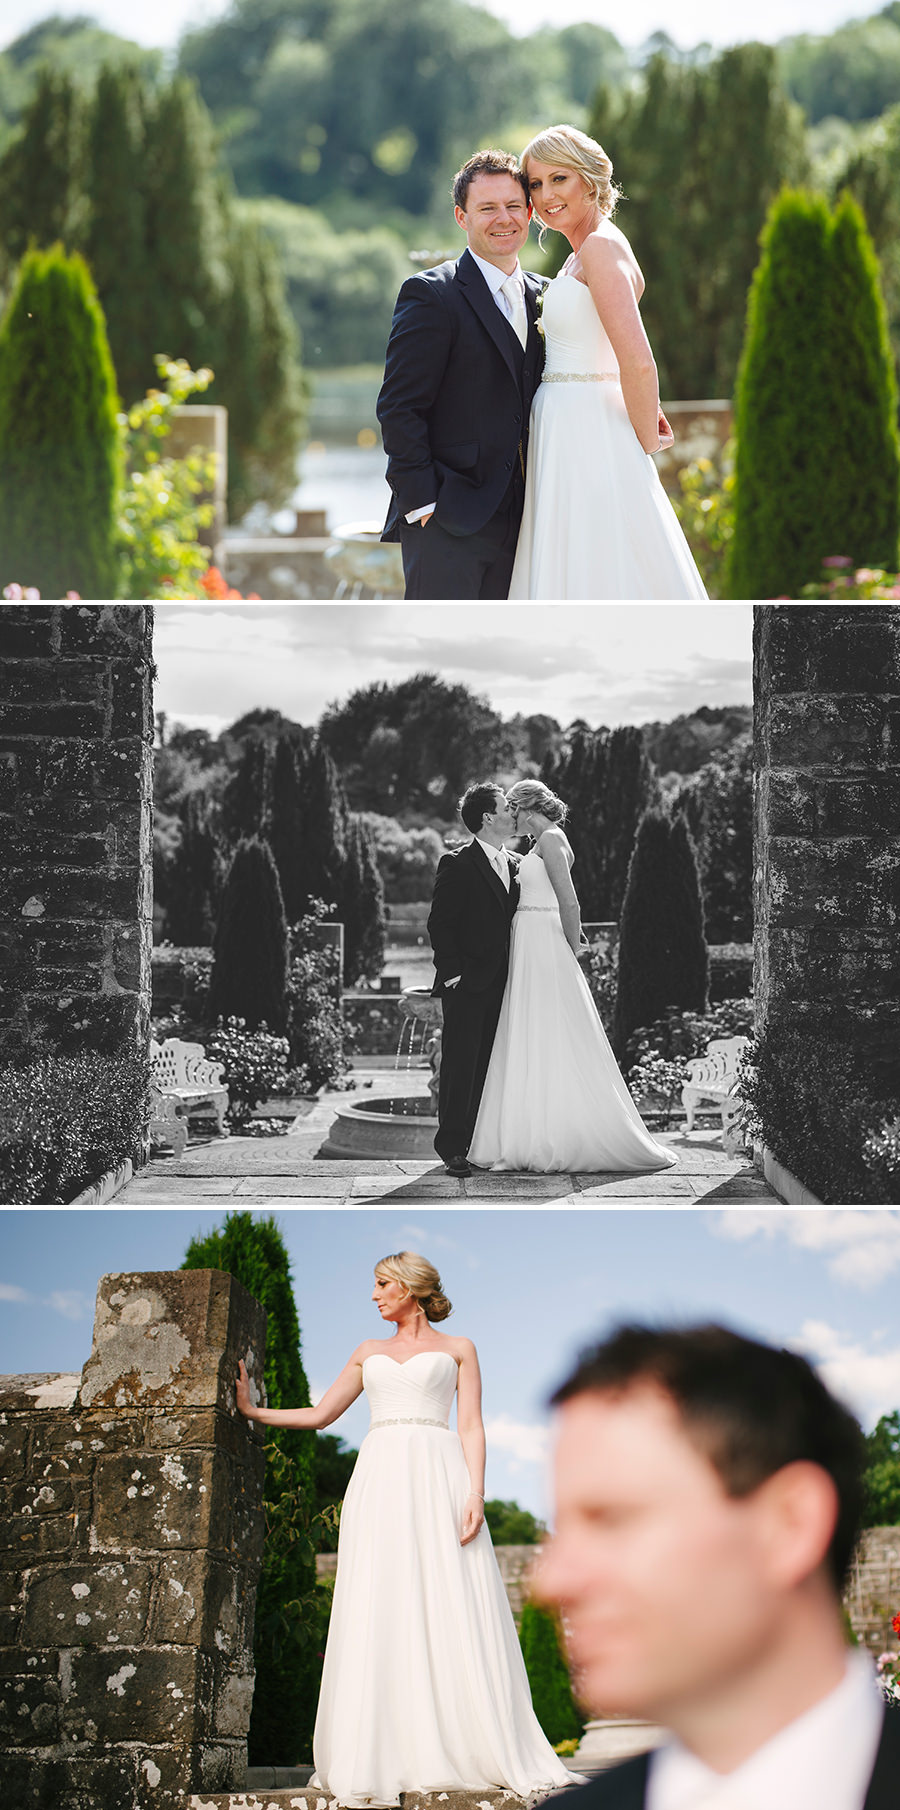 27_lough rynn castle_Ireland photographers